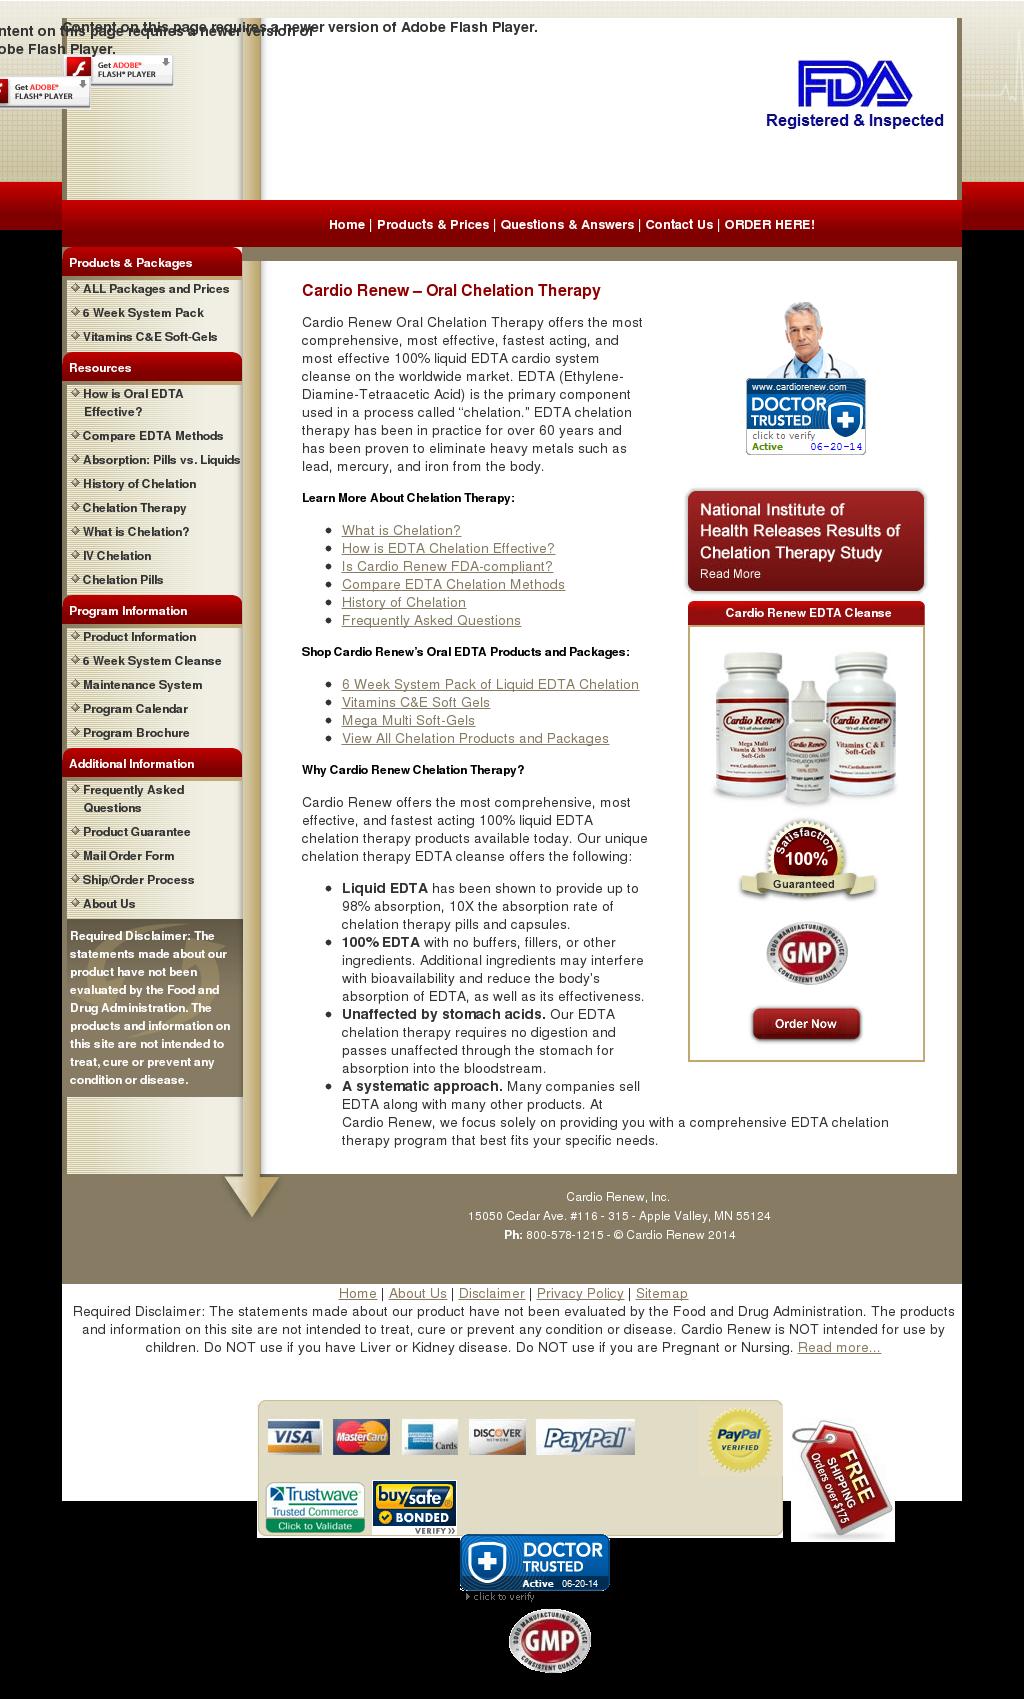 Cardio Renew Competitors, Revenue and Employees - Owler